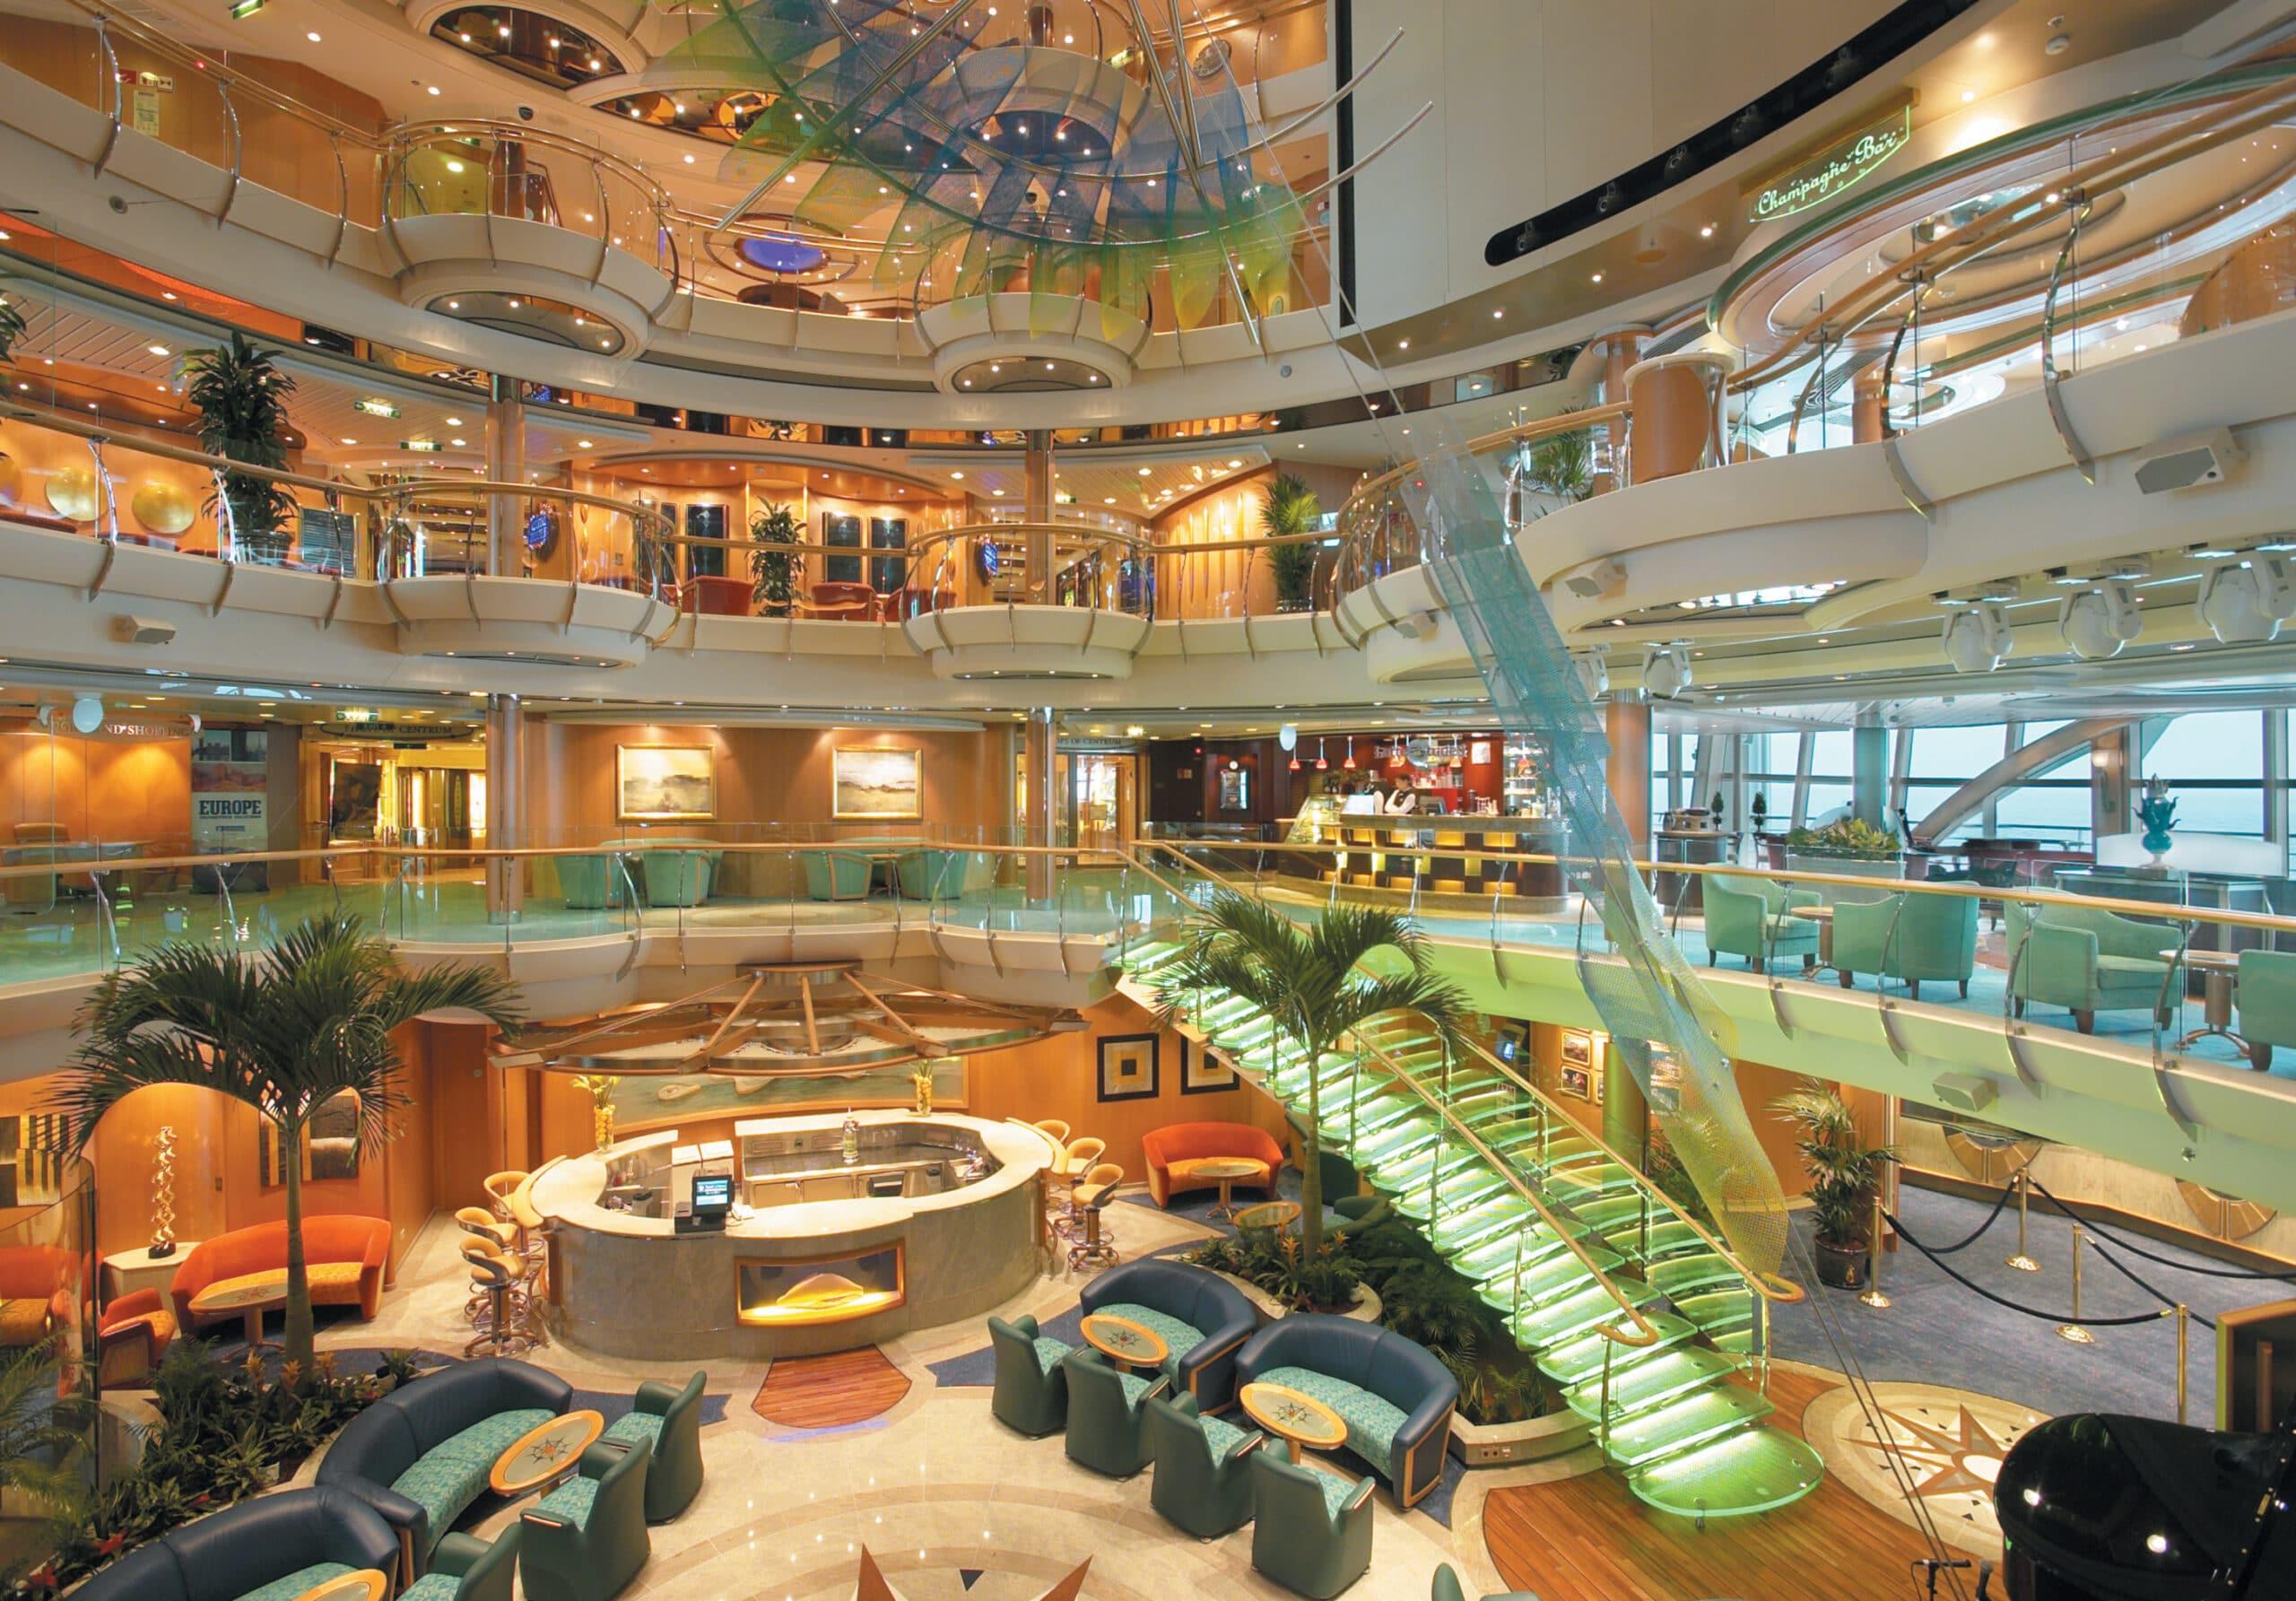 Cruiseschip-Brilliance of the Seas-Royal Caribbean International-Atrium